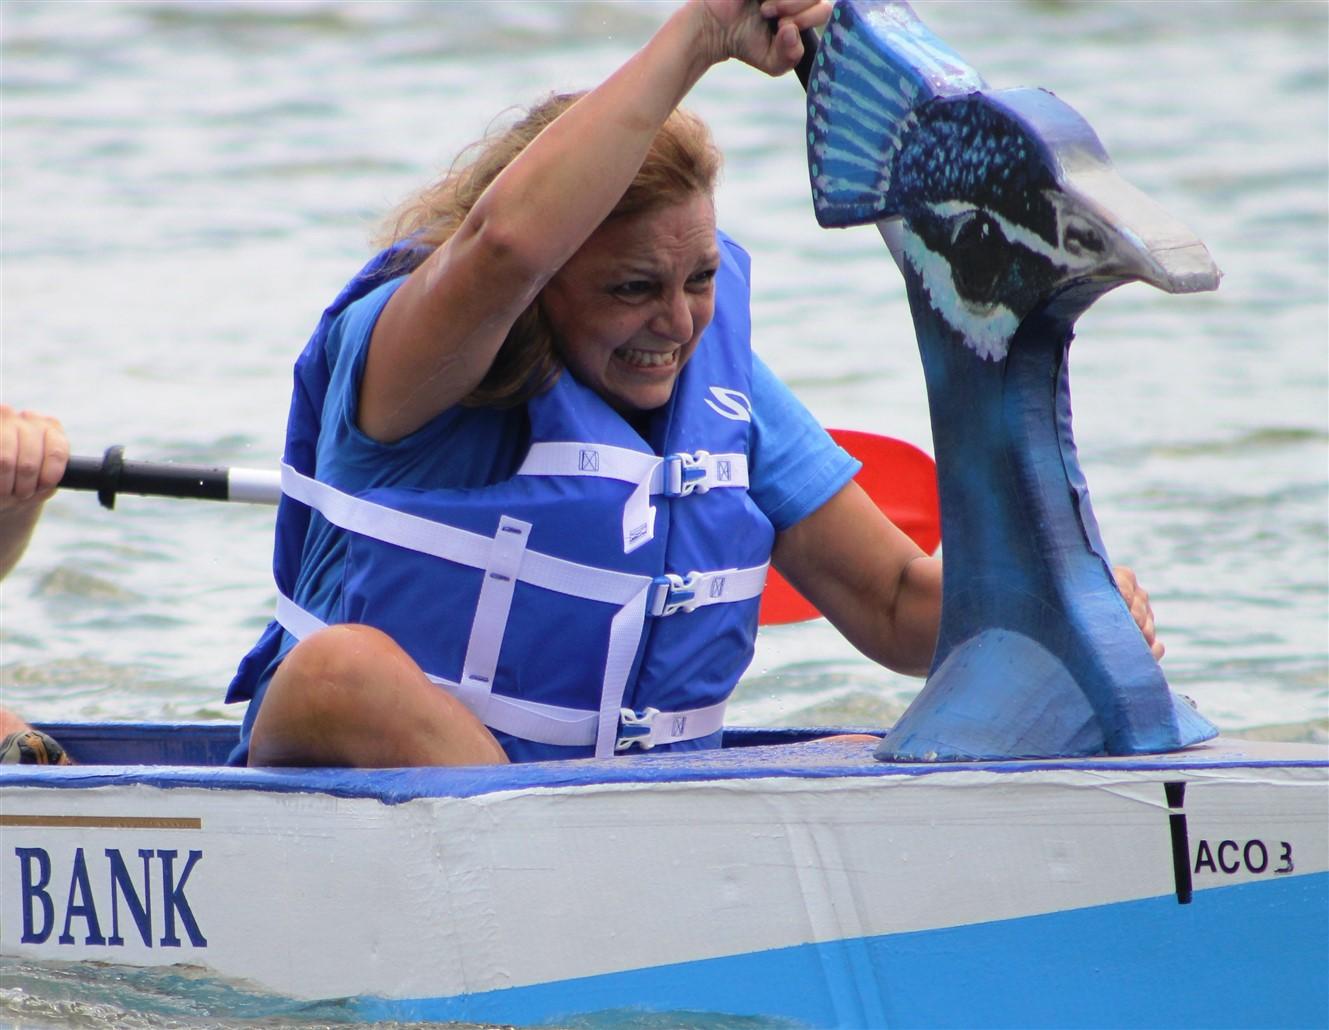 2015 08 15 255 New Richmond Ohio Cardboard Boat Races.jpg